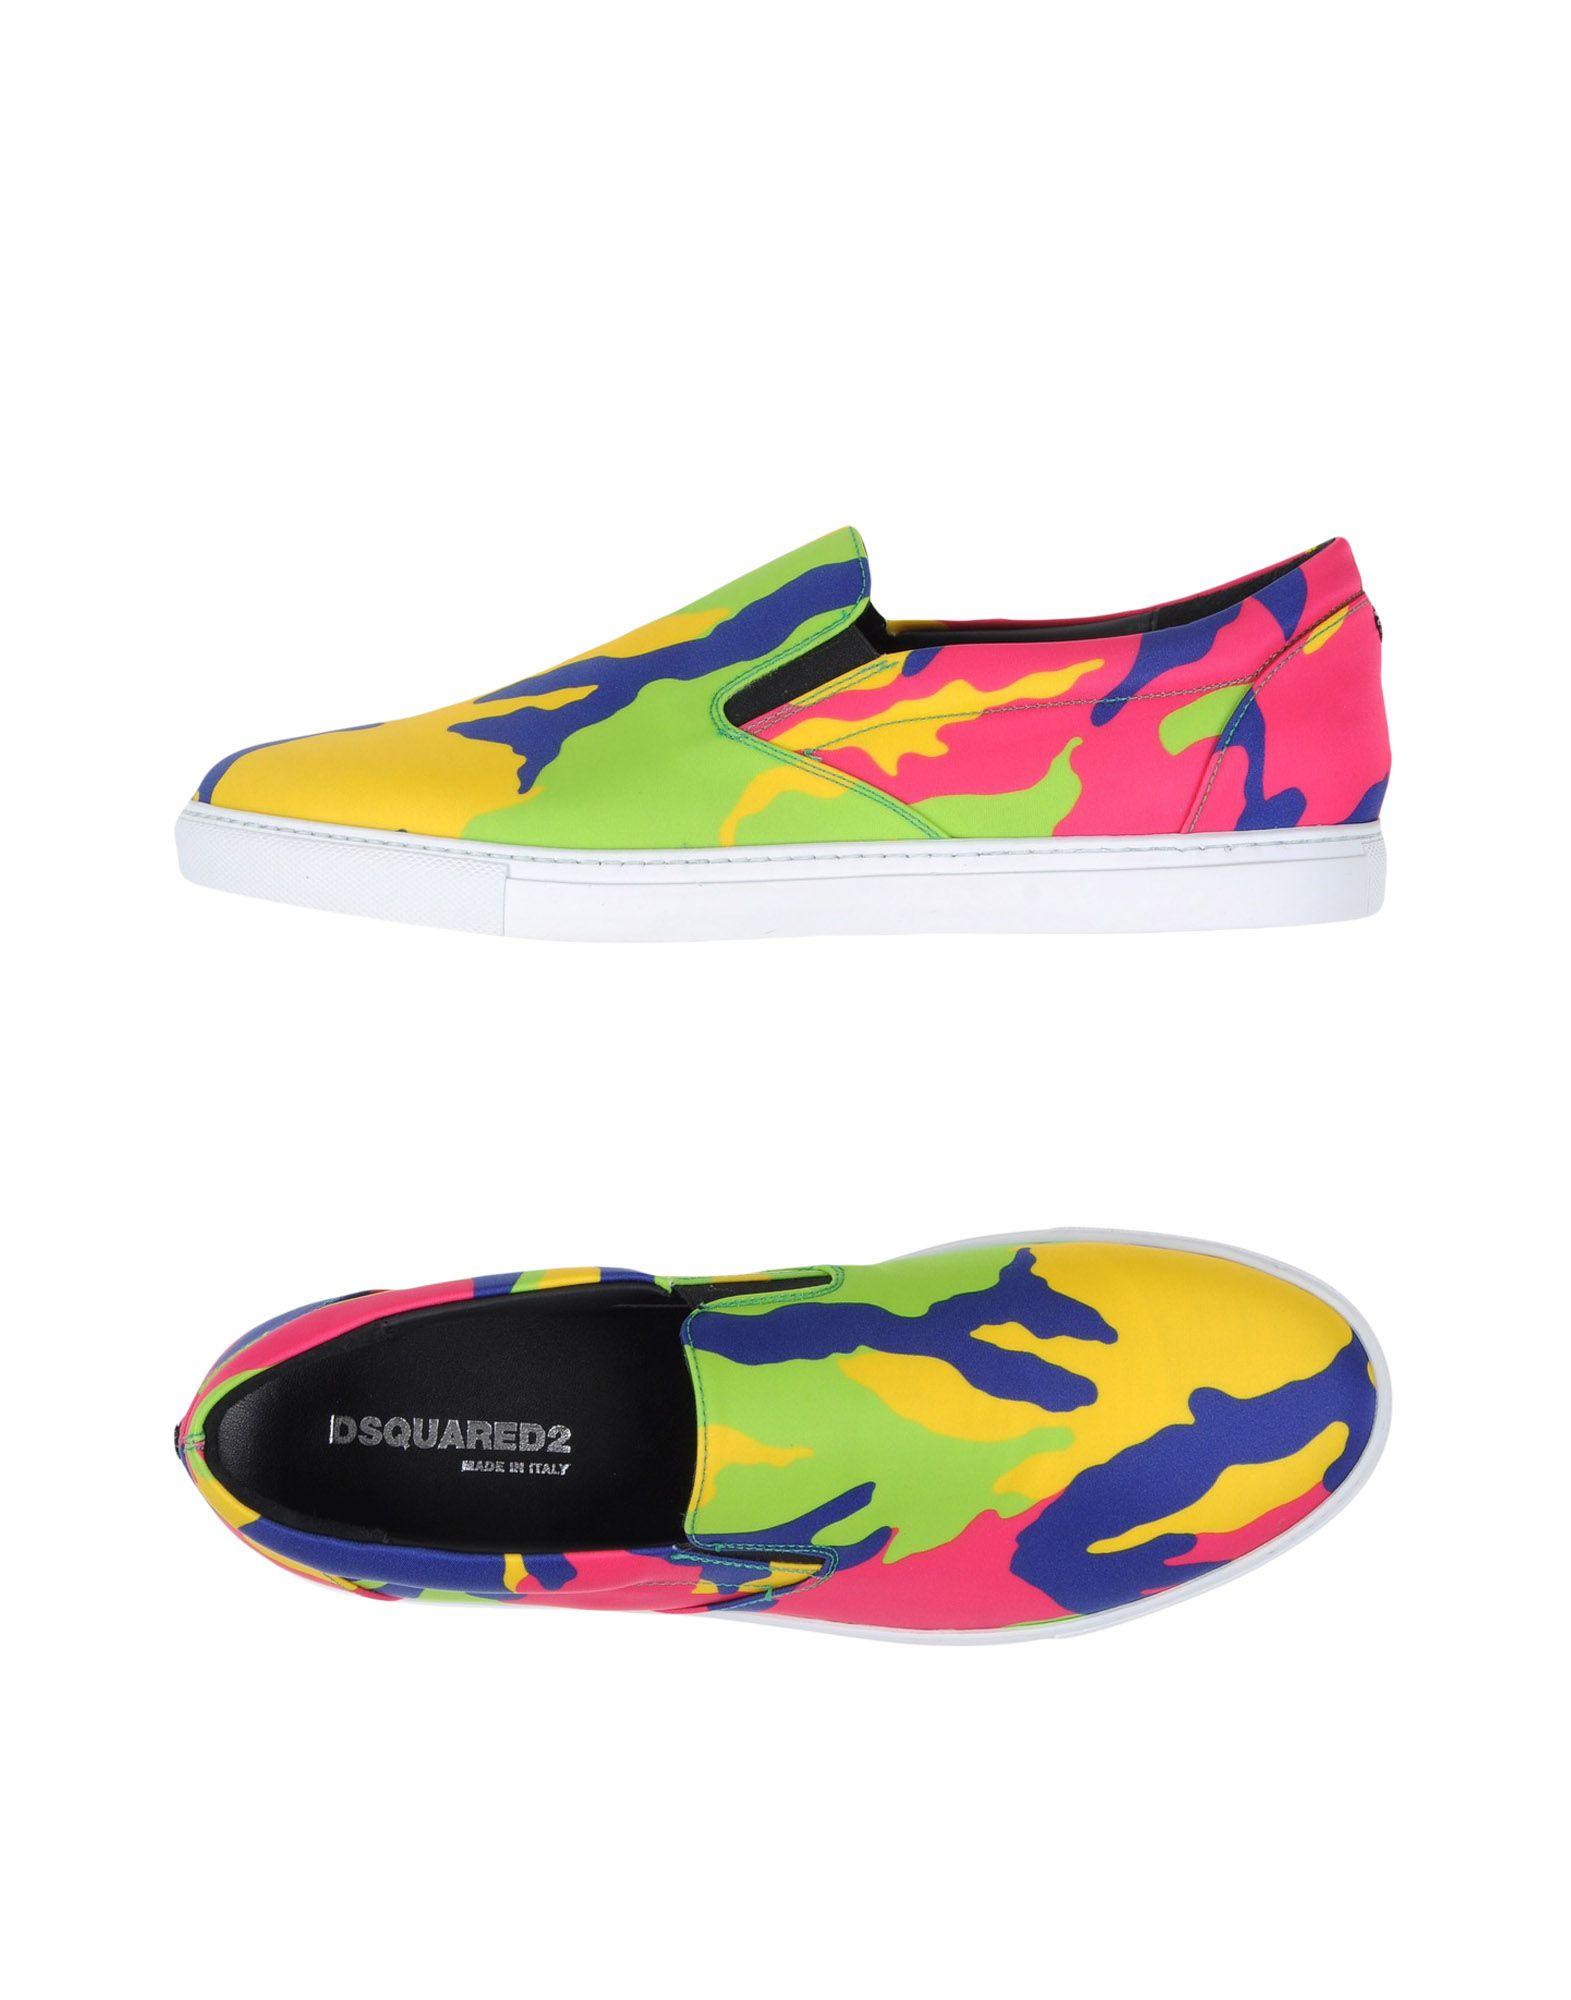 Dsquared2 Sneakers Herren  44985270NL Gute Qualität beliebte Schuhe